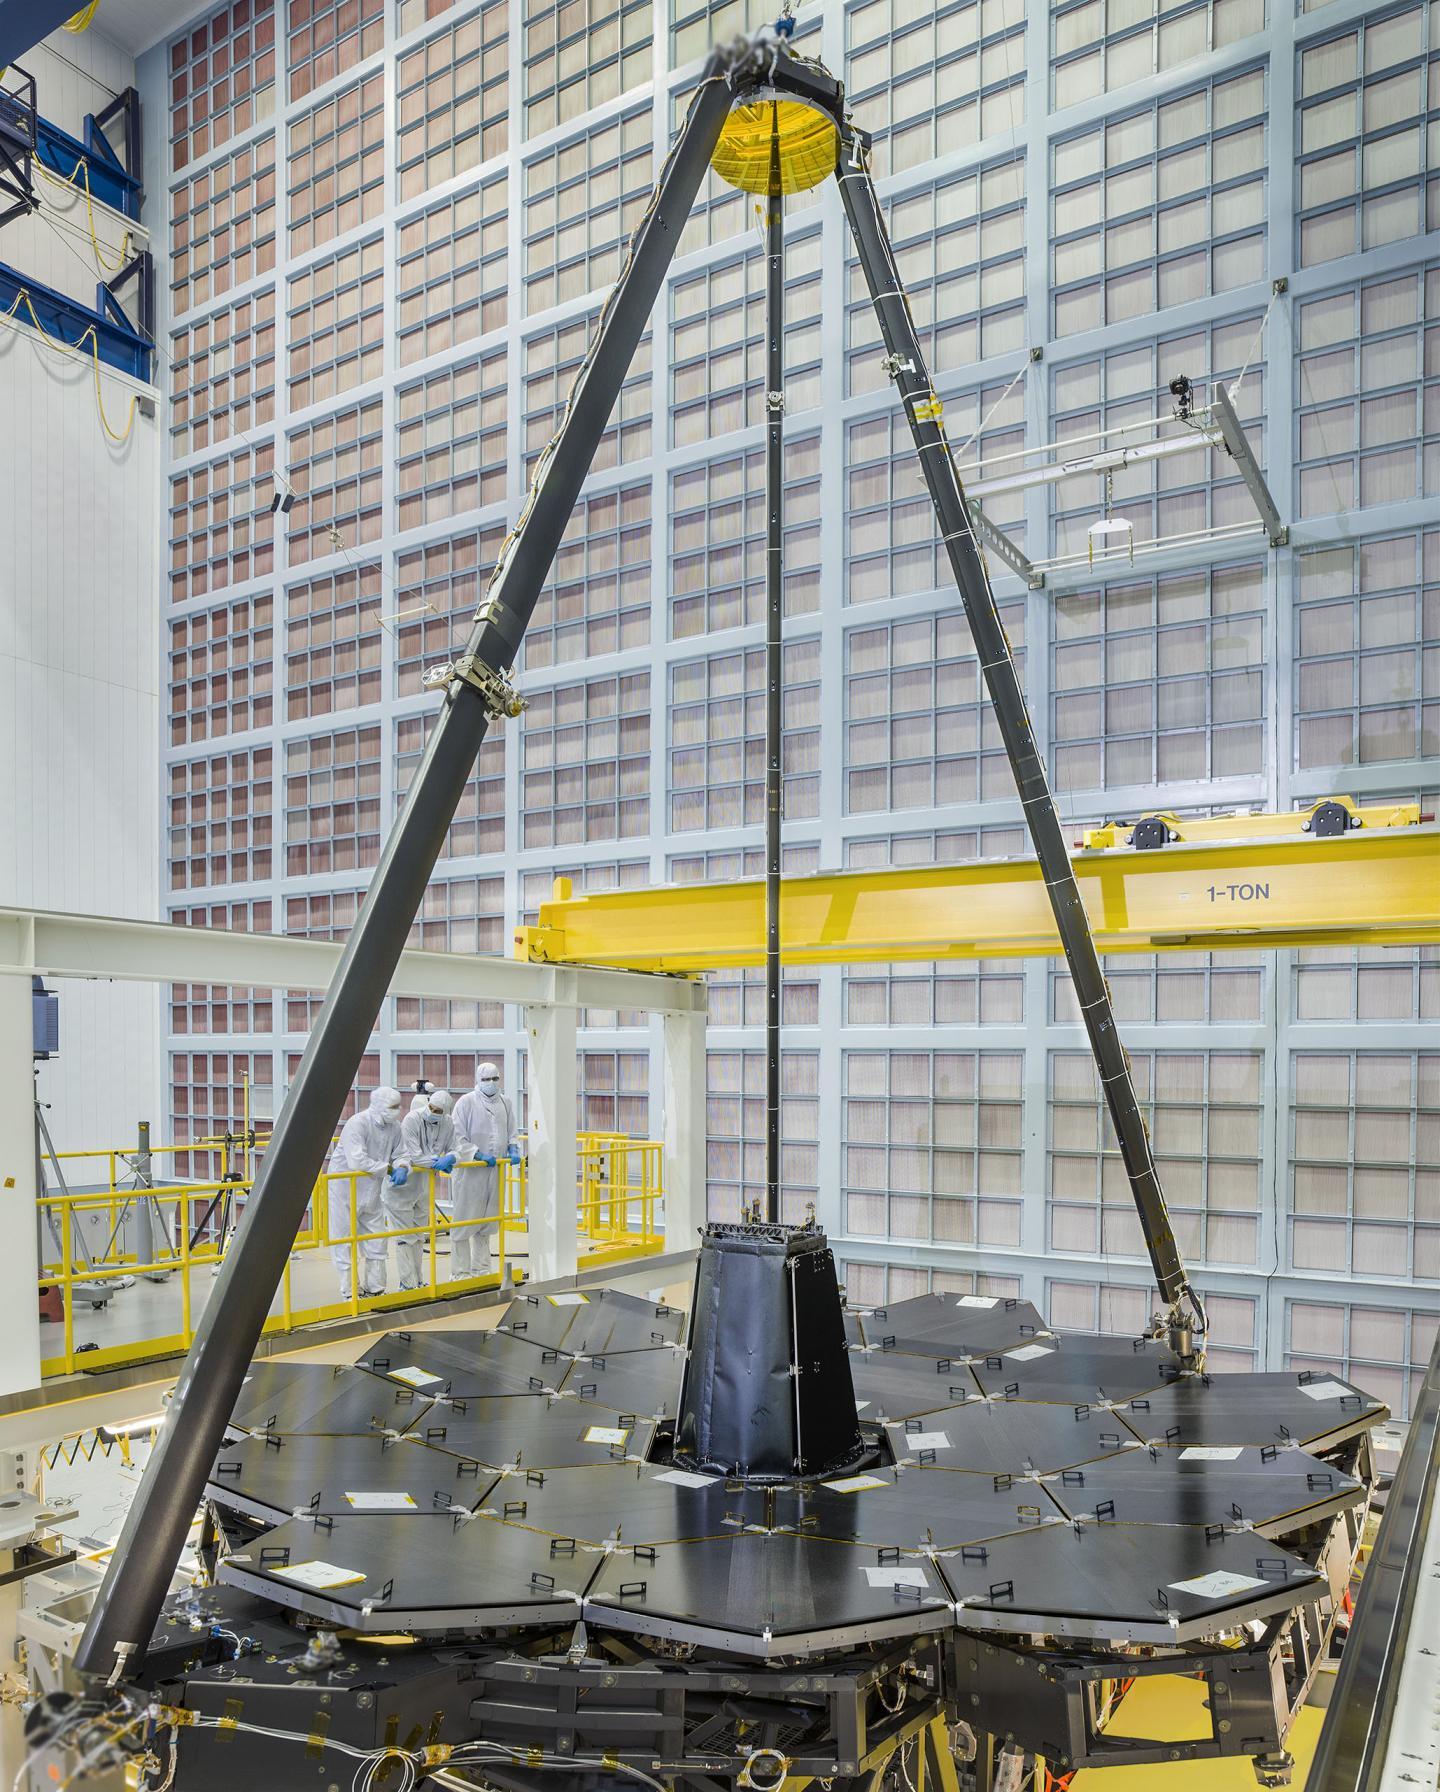 cryogenic links of the week - space NASA's James Webb telescope